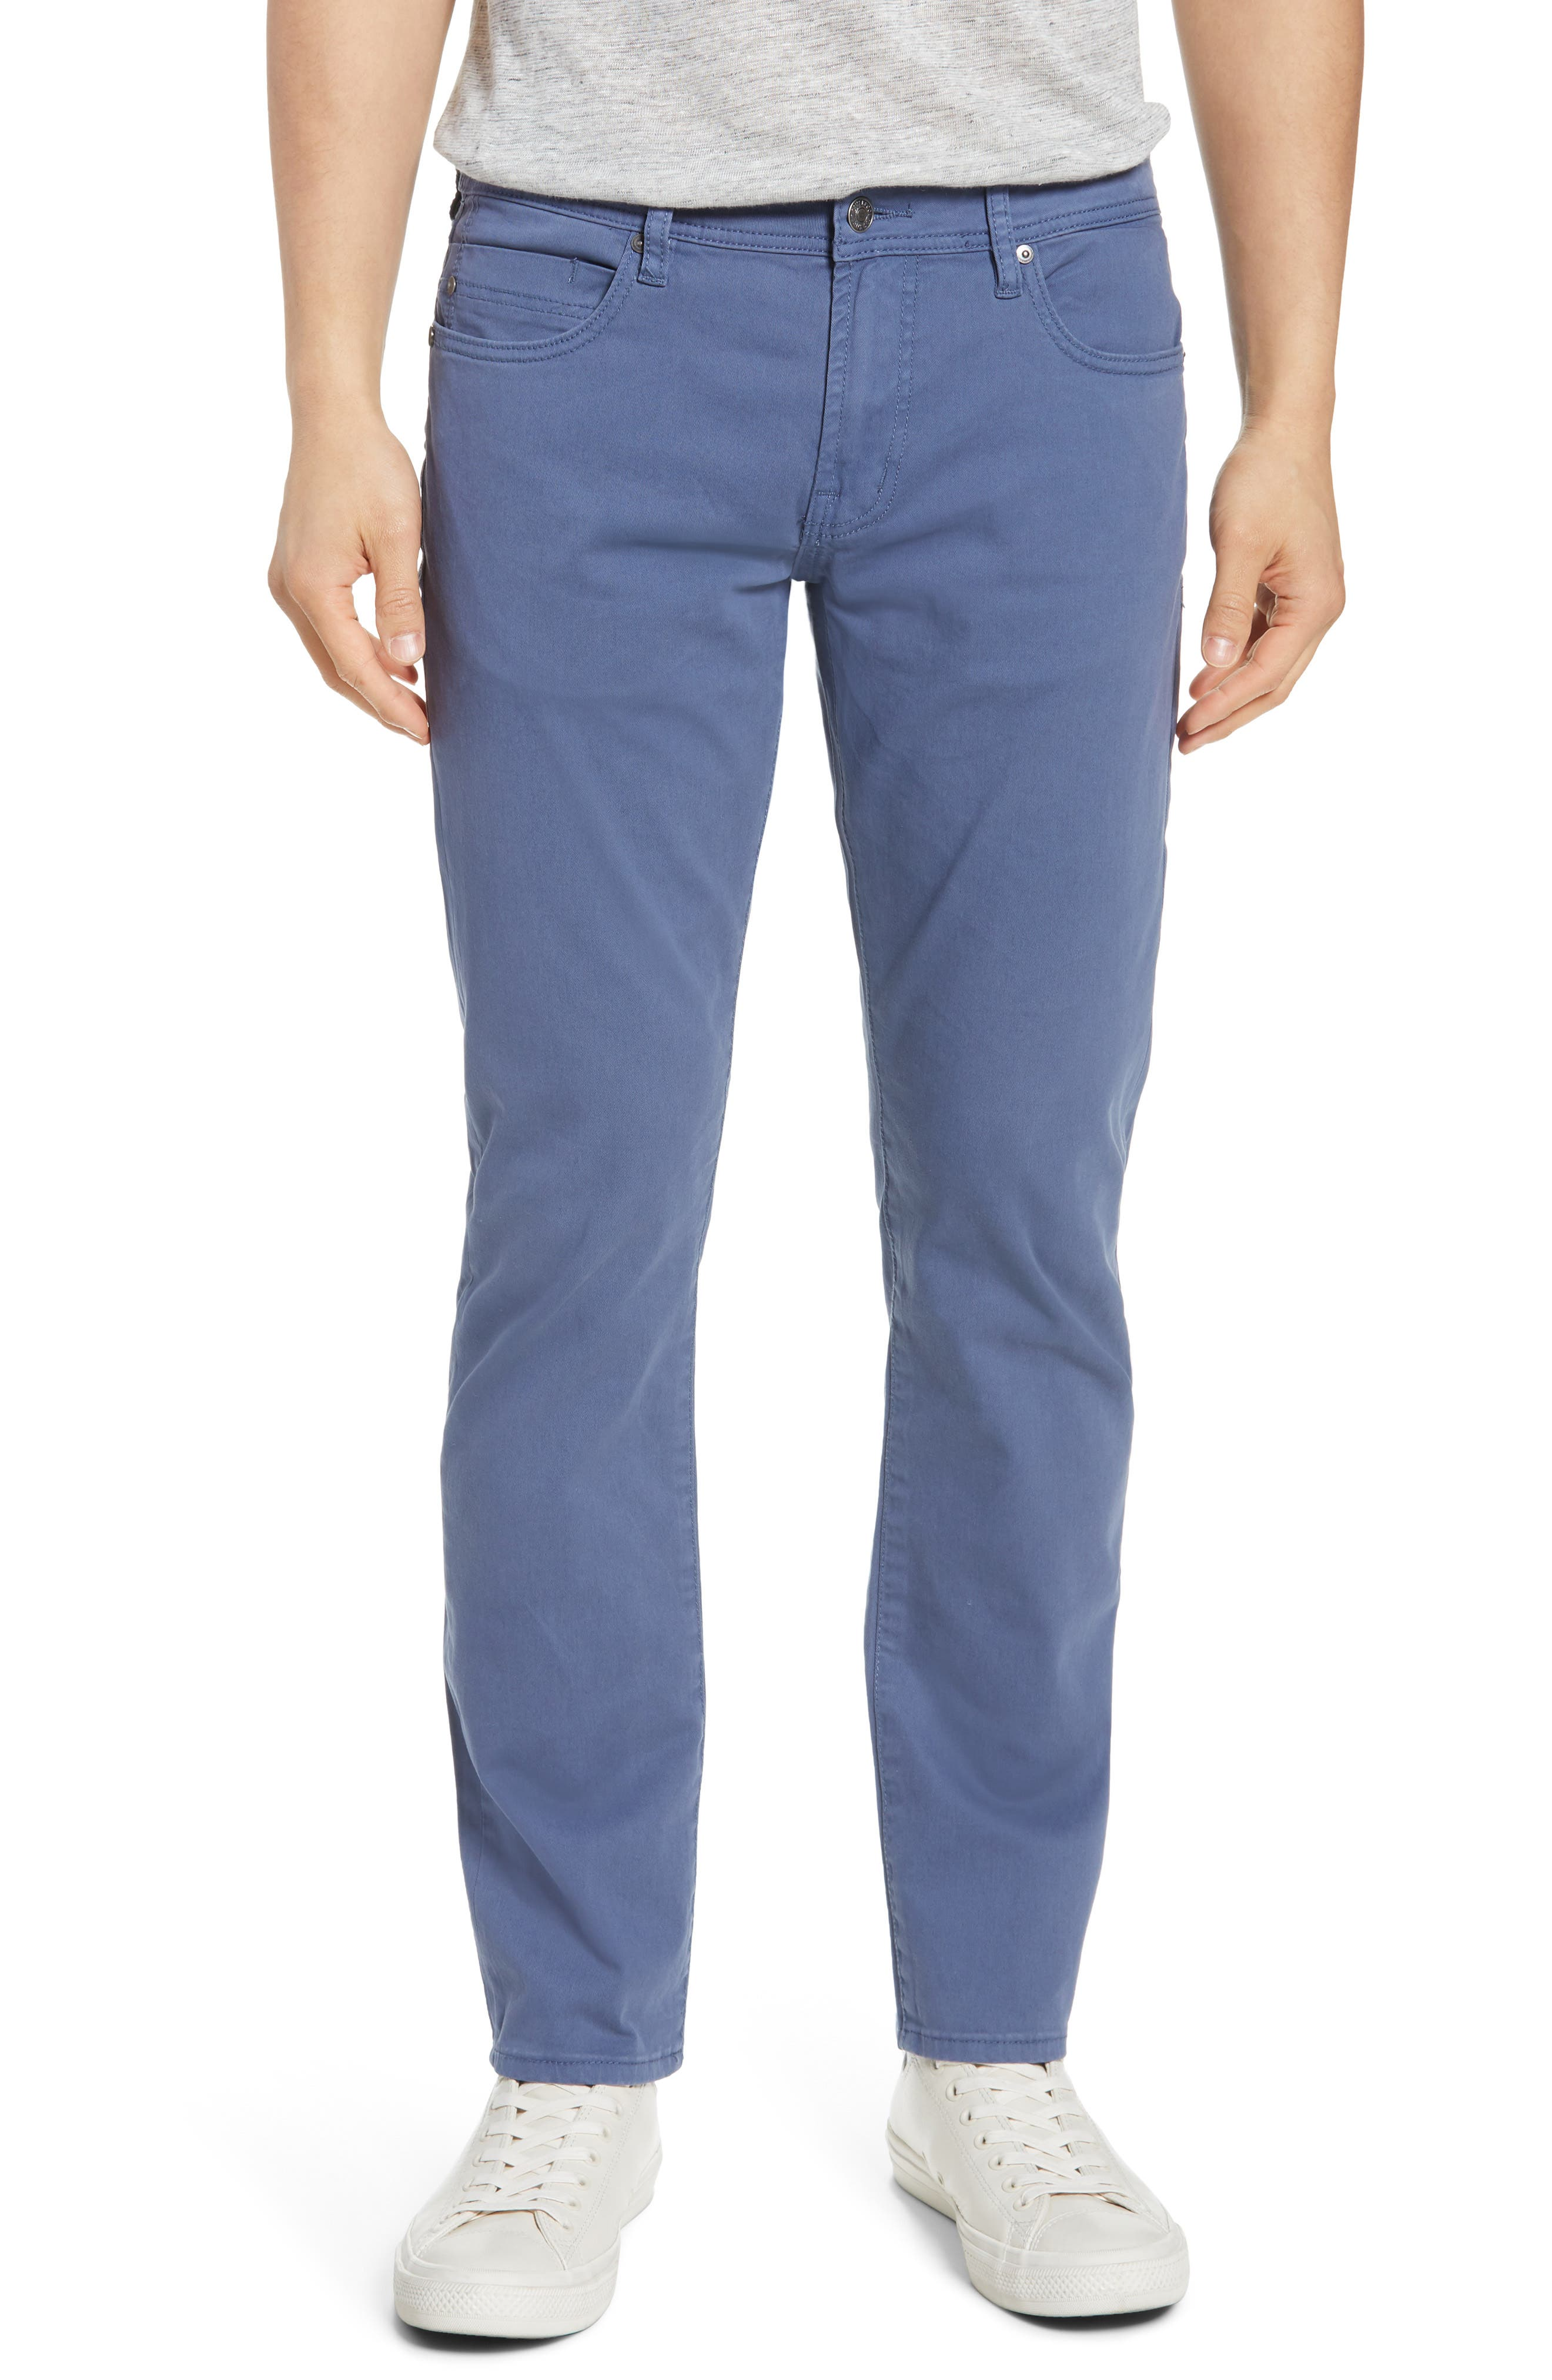 Image of Liverpool Jeans Co Kingston Modern Straight Leg Twill Pants